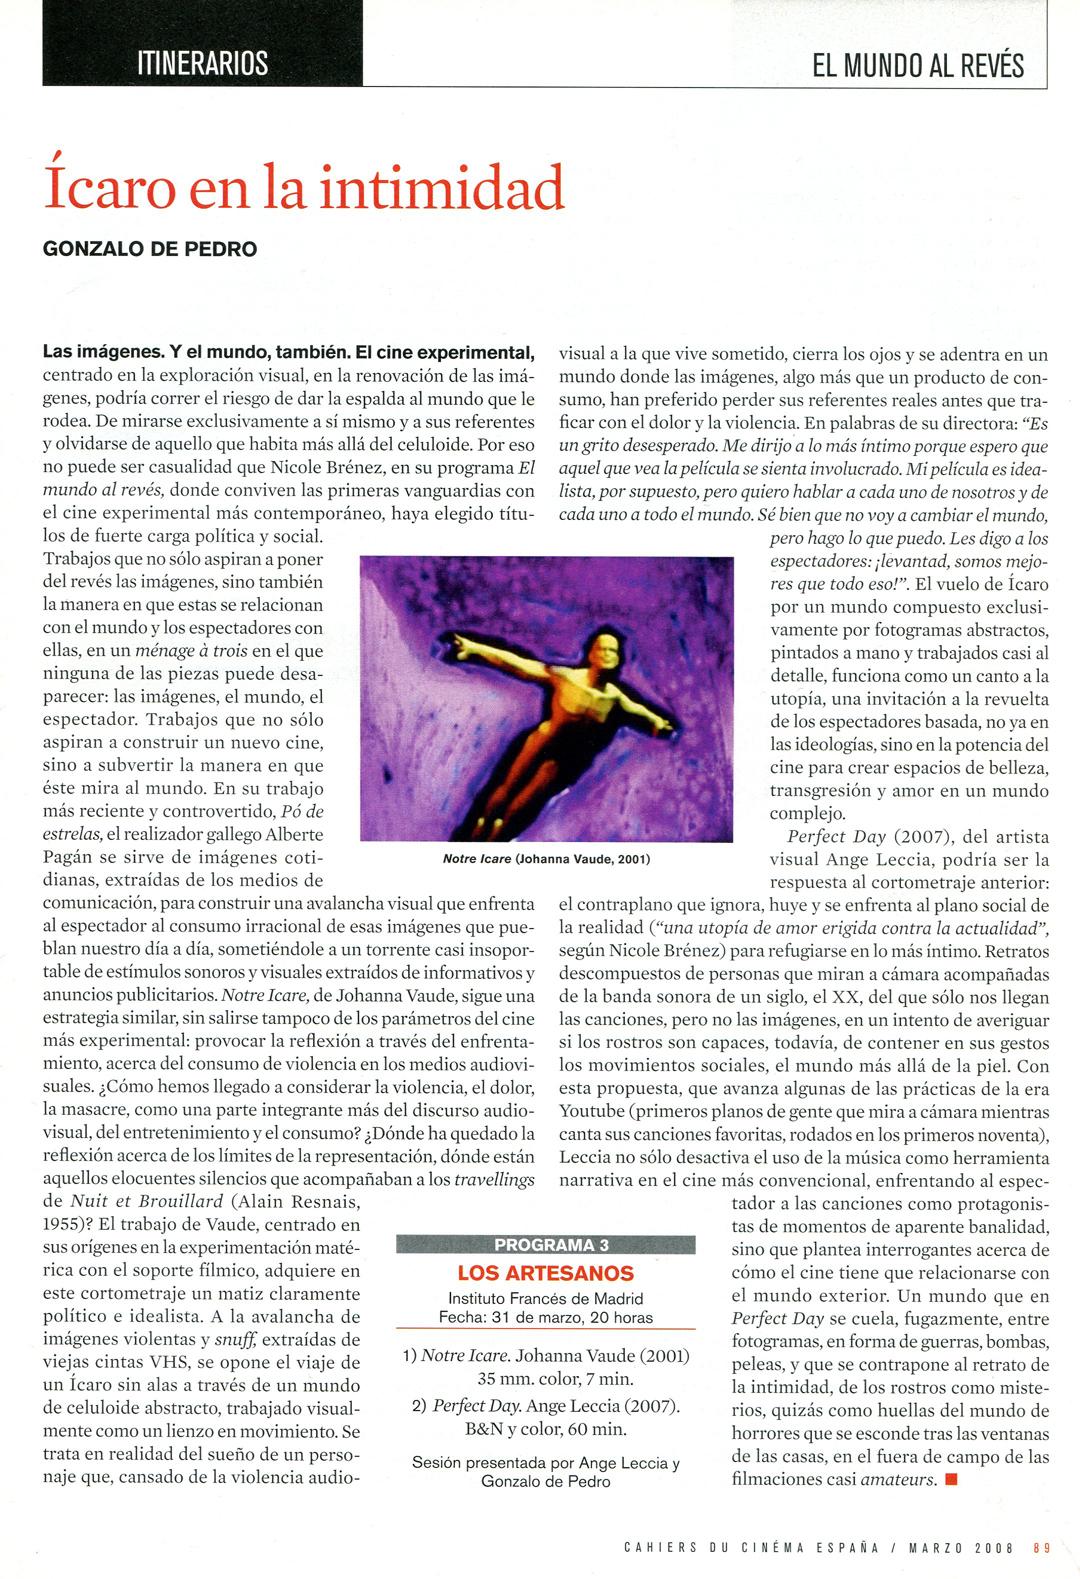 Cahiers du Cinema Espana - johanna vaude